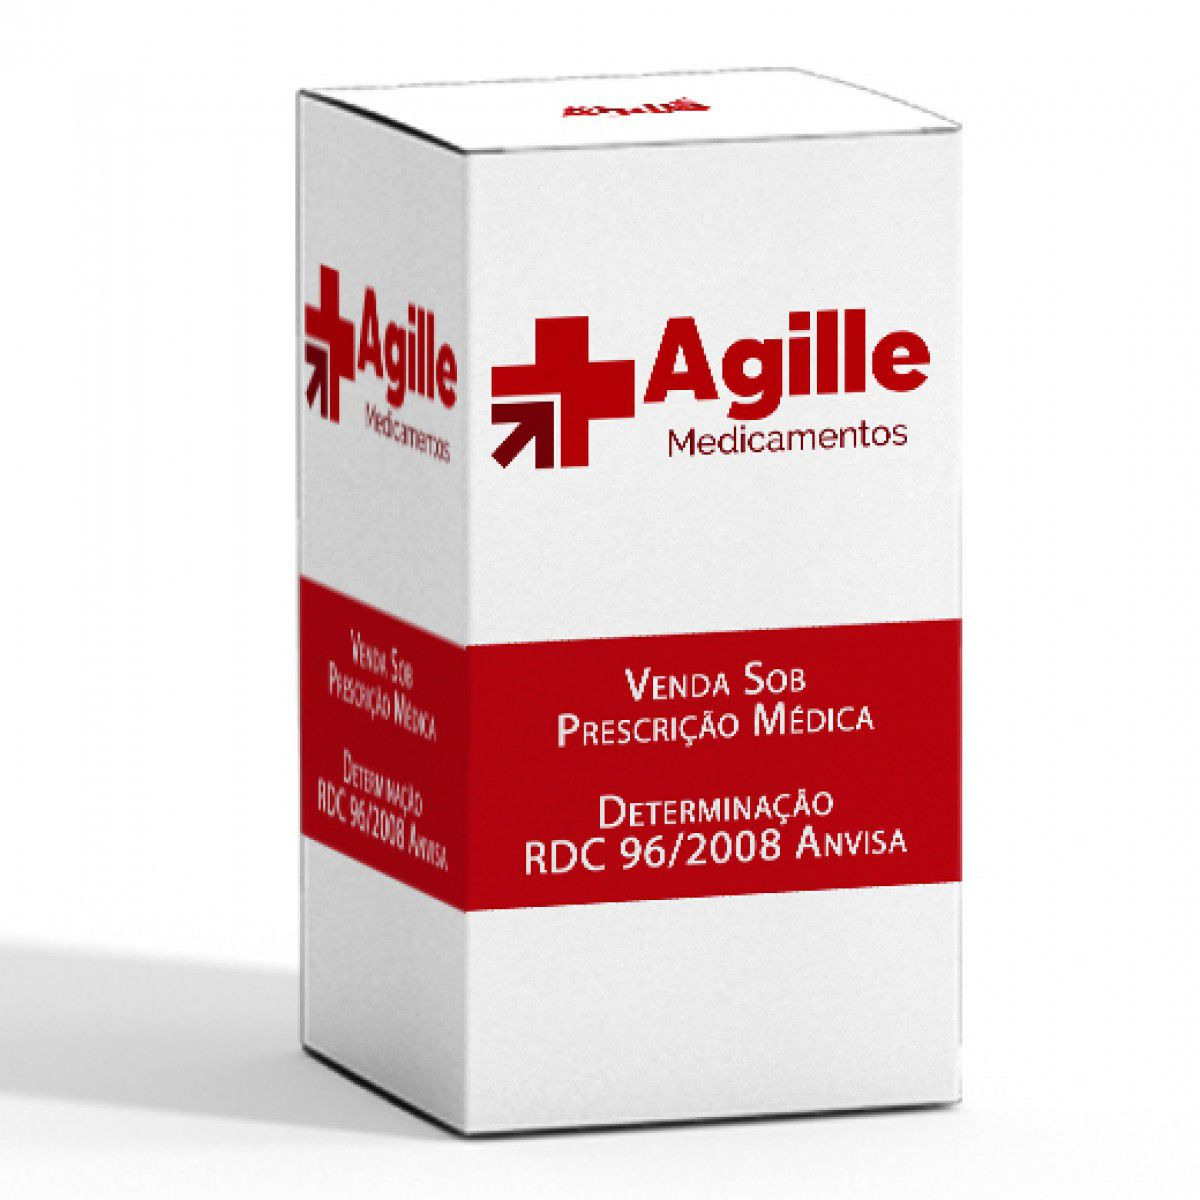 TEMODAL SACHET 250MG COM 5 COMPRIMDOS  - Agille Speciality